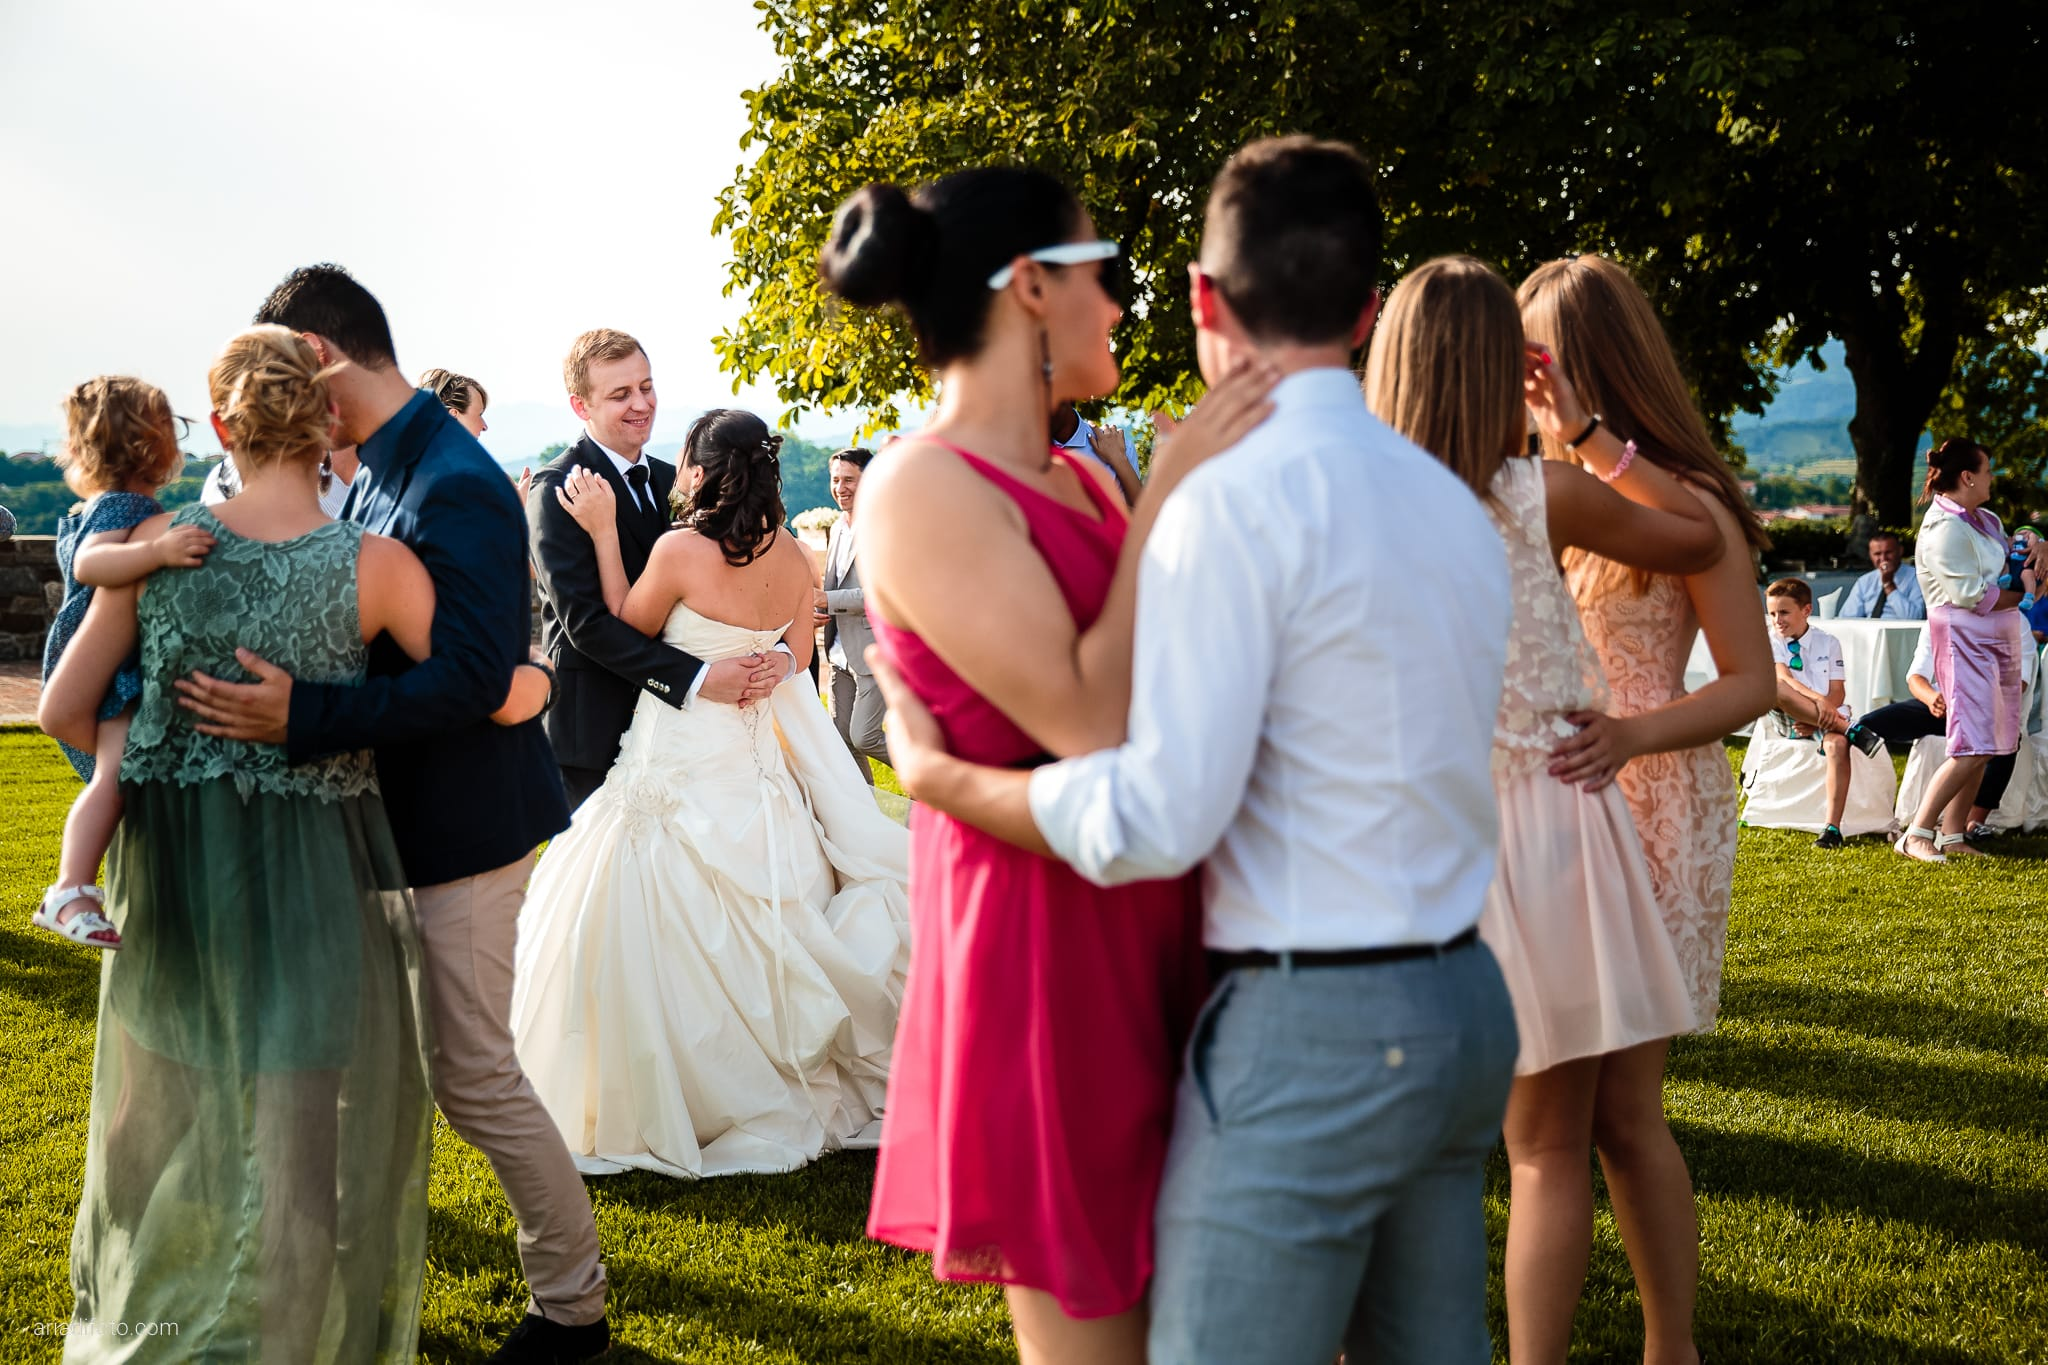 Chiara Mensur matrimonio Pradamano Baronesse Tacco San Floriano del Collio Gorizia ricevimento primo ballo